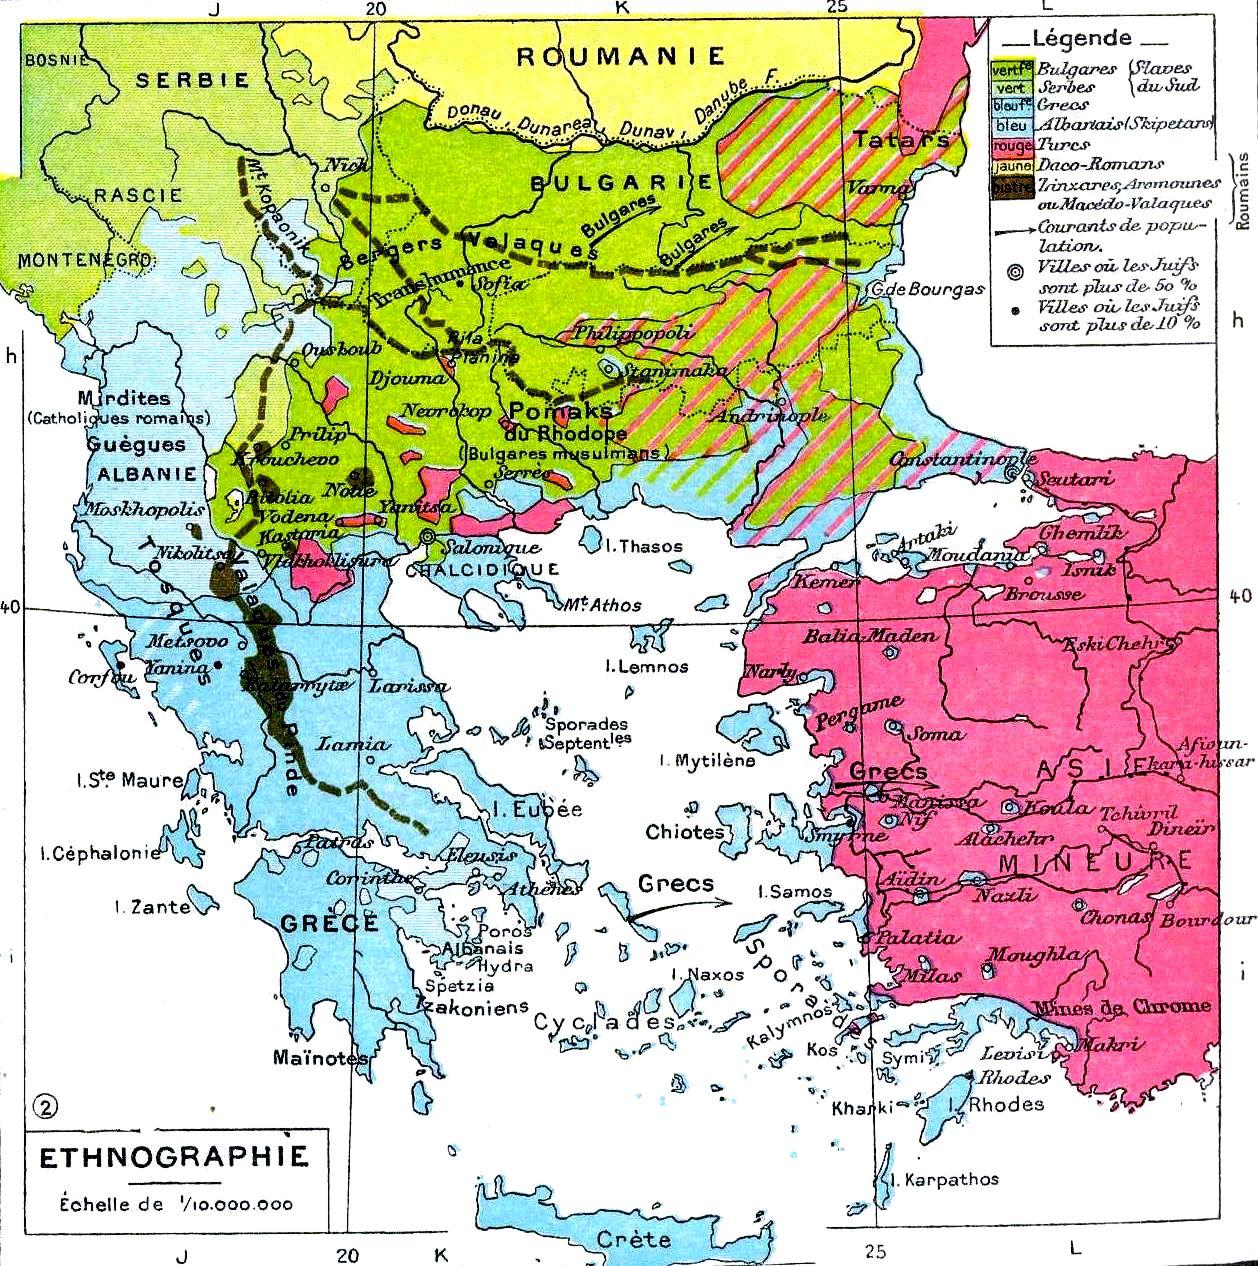 Balkans-ethnique